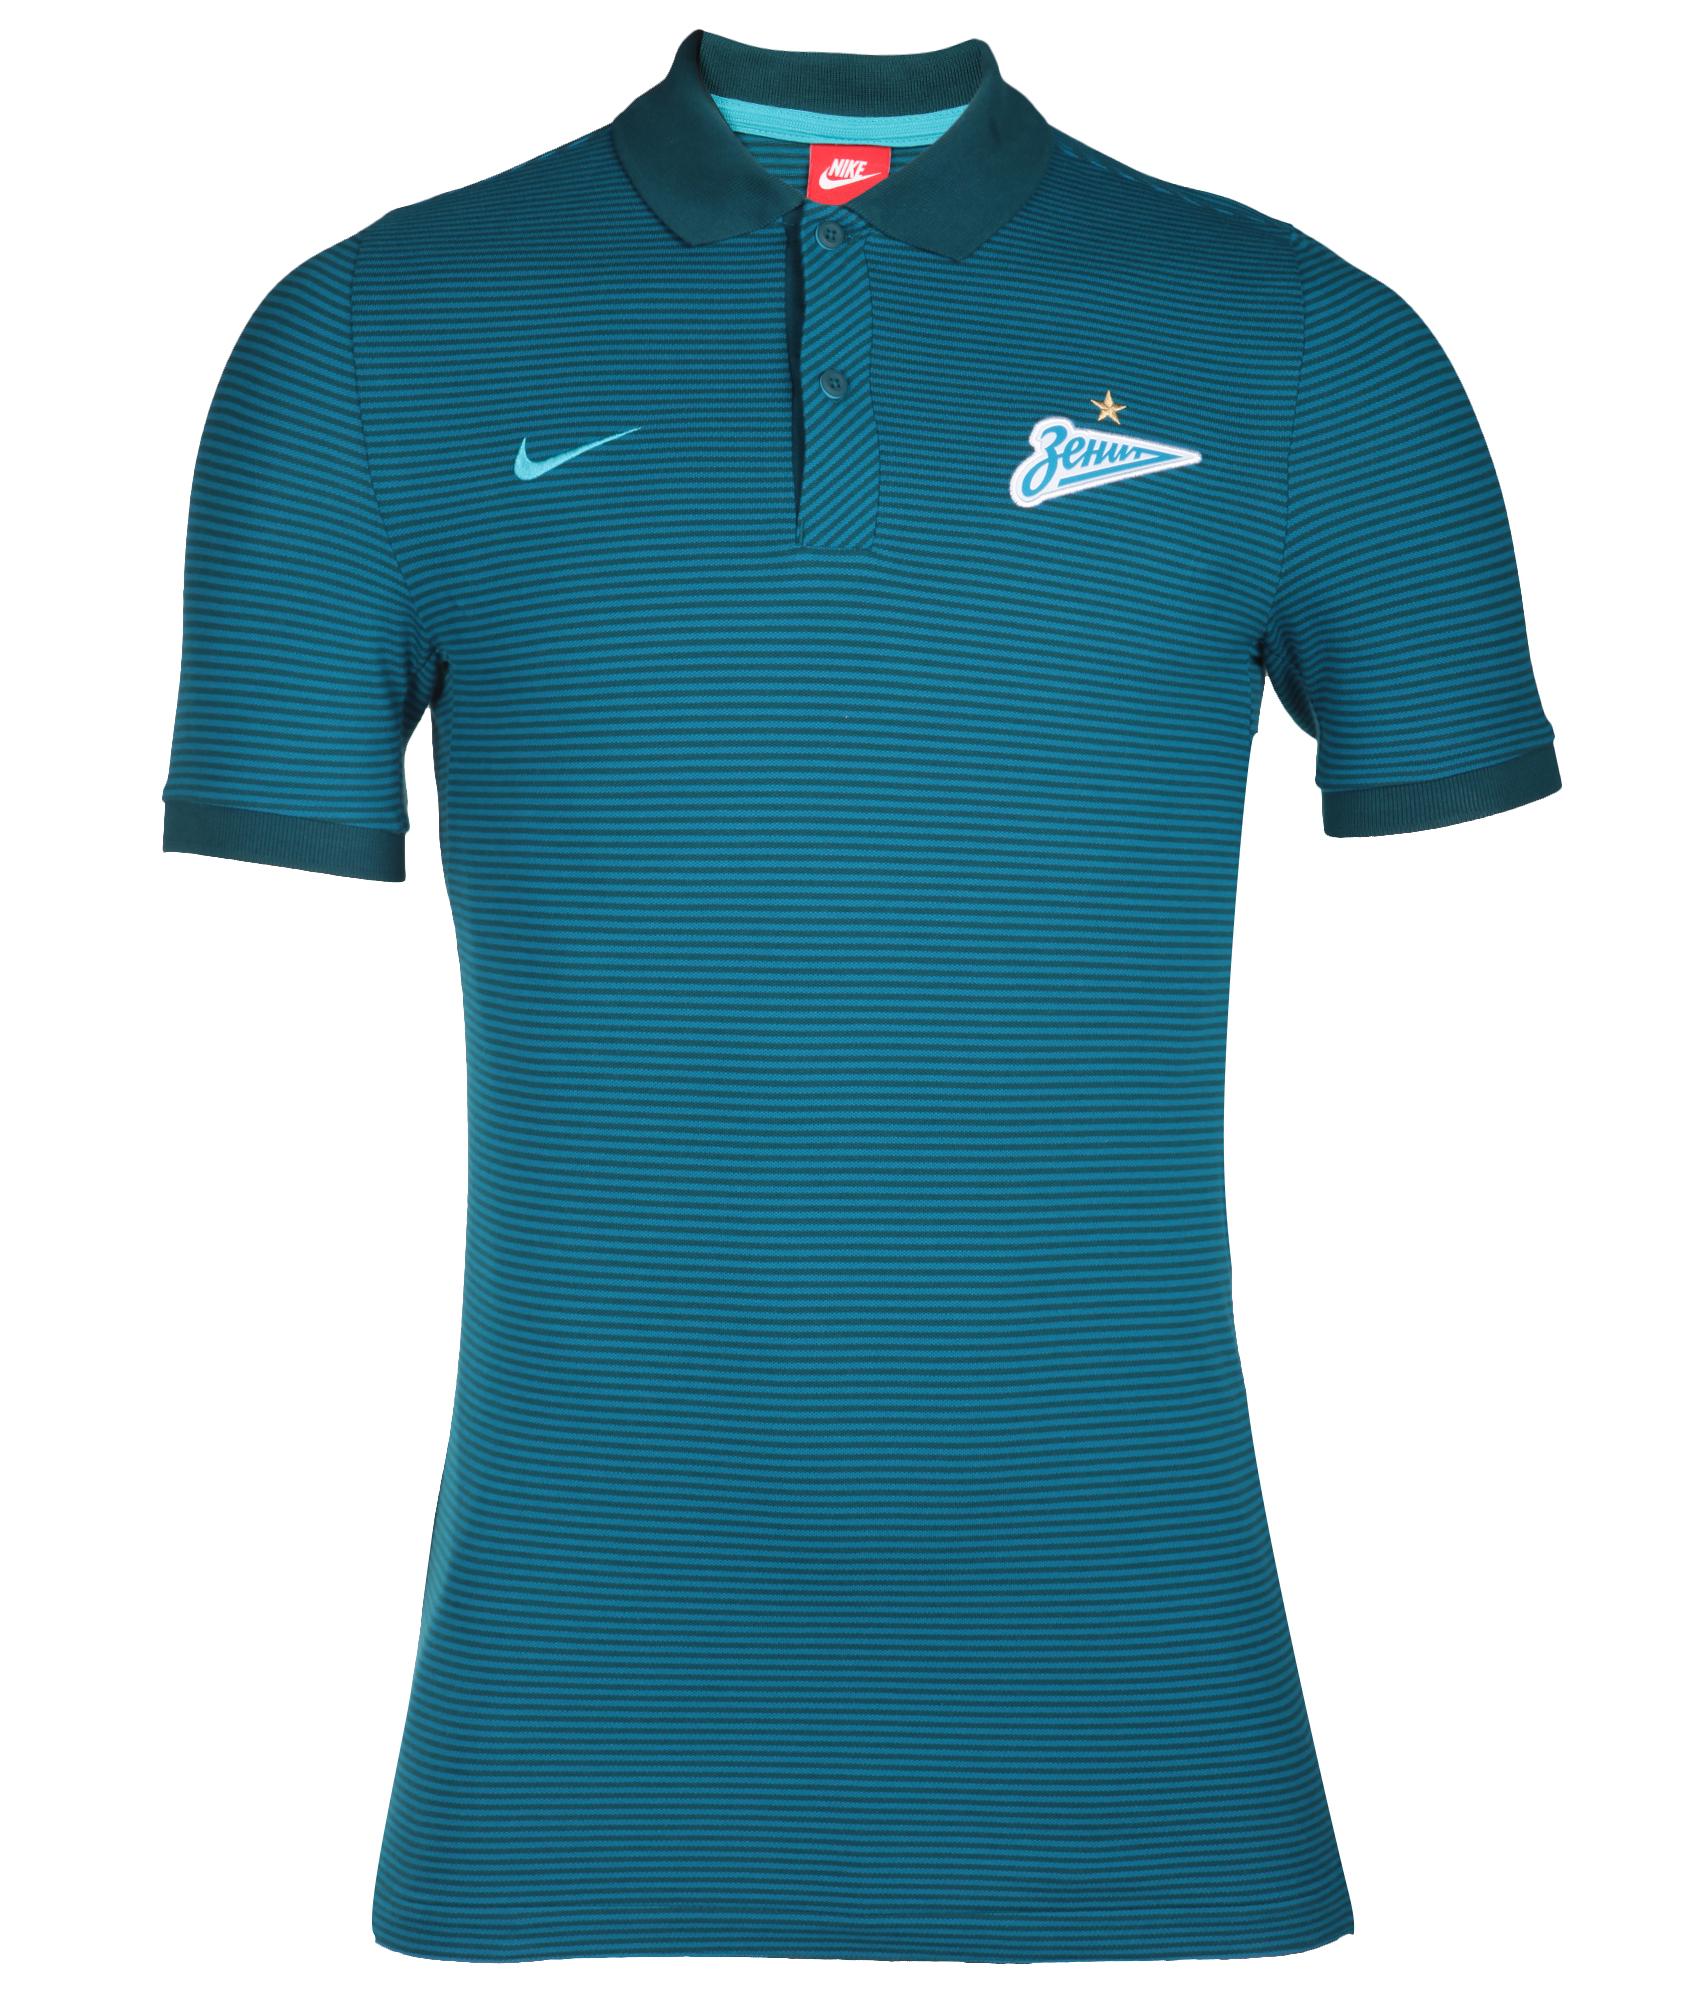 Поло Nike Nike Цвет-Сине-Зеленый